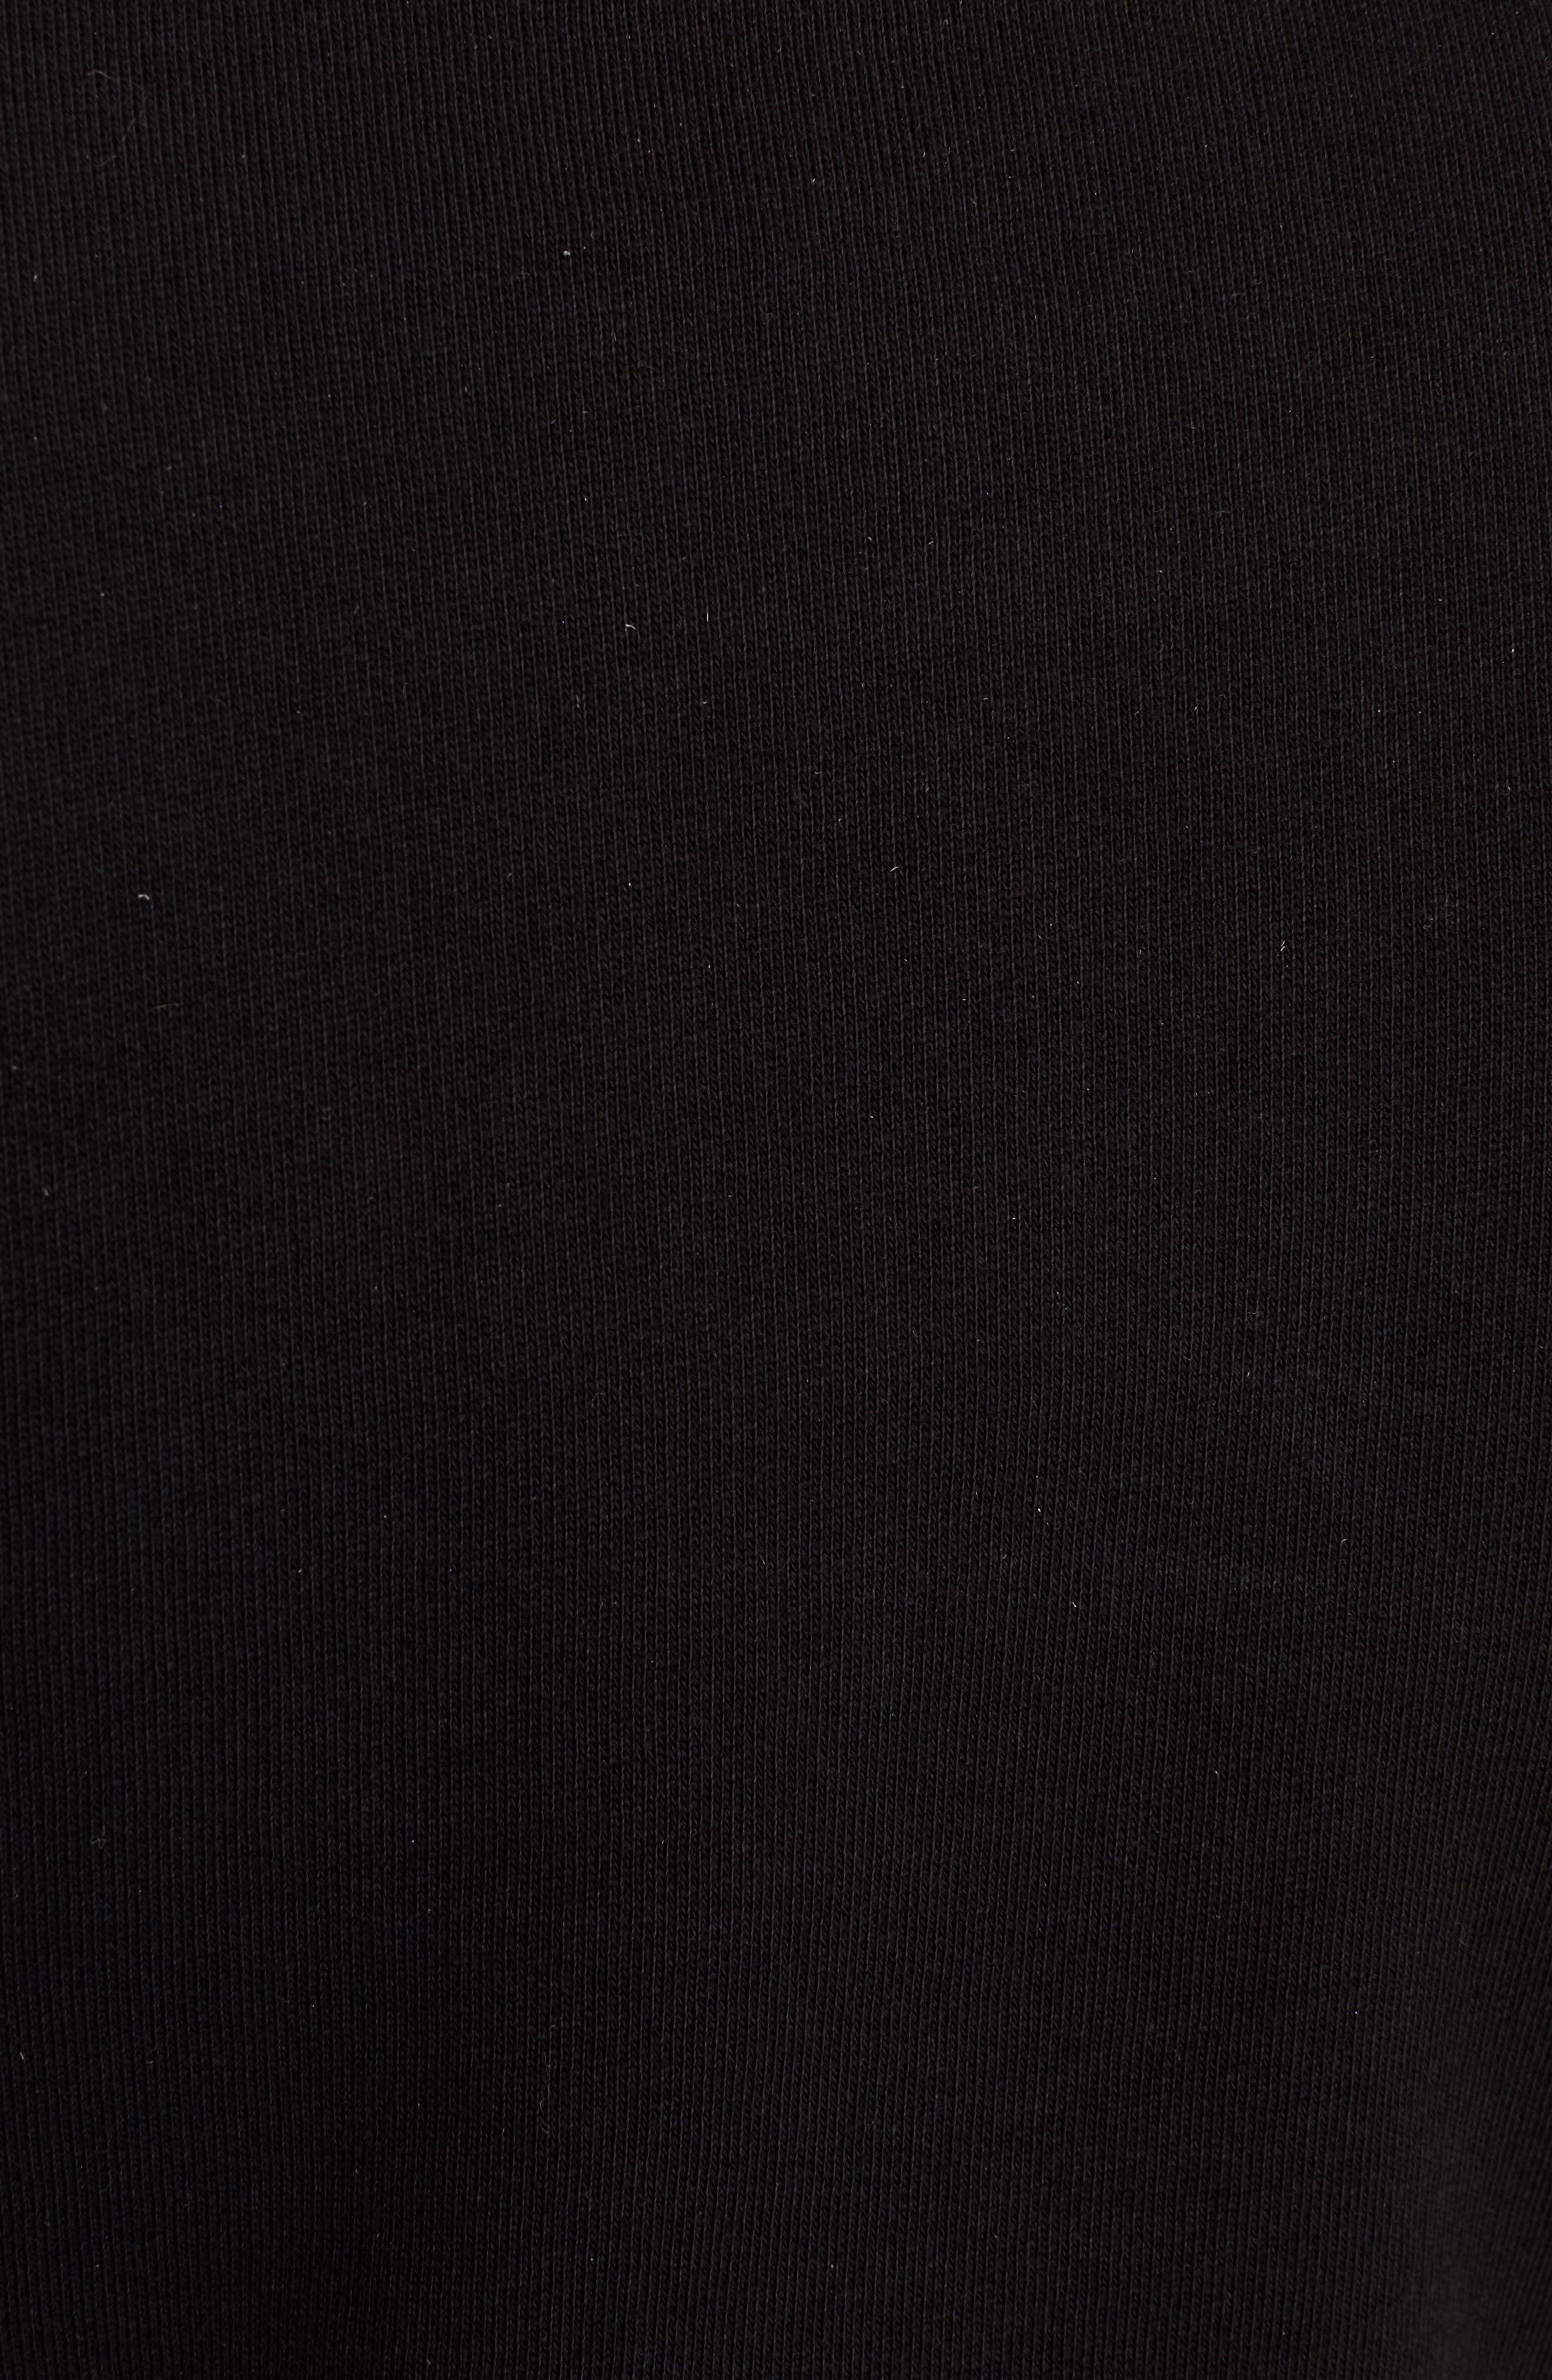 Tiger Flare Embroidered T-Shirt Dress,                             Alternate thumbnail 5, color,                             Black